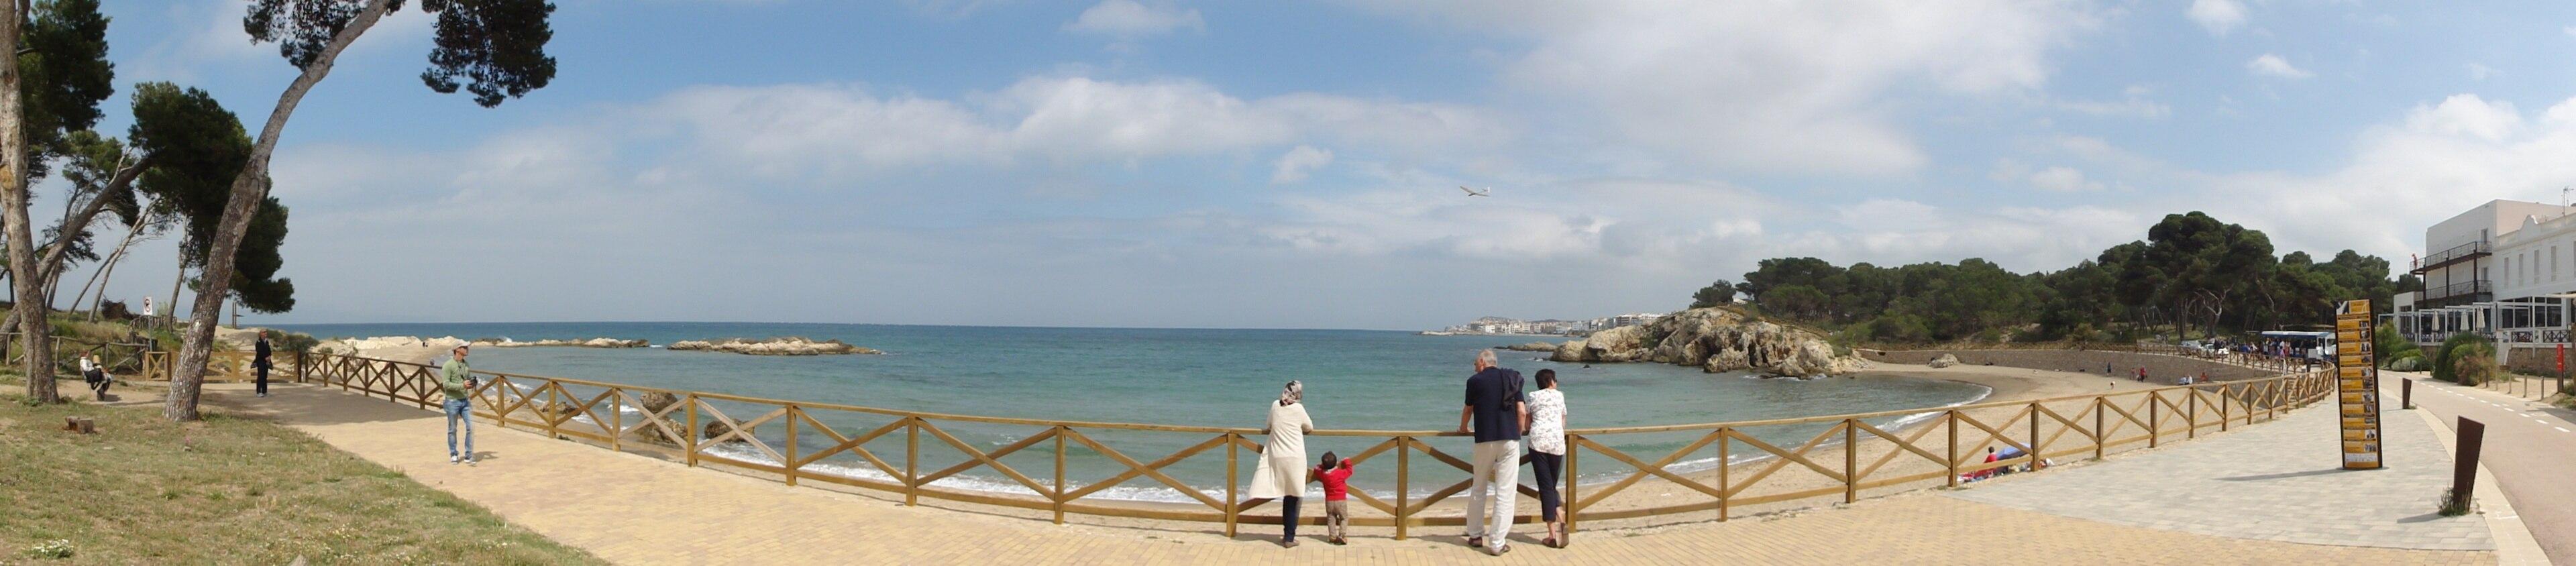 Portitxol Beach, L'Escala, Catalonia, Spain